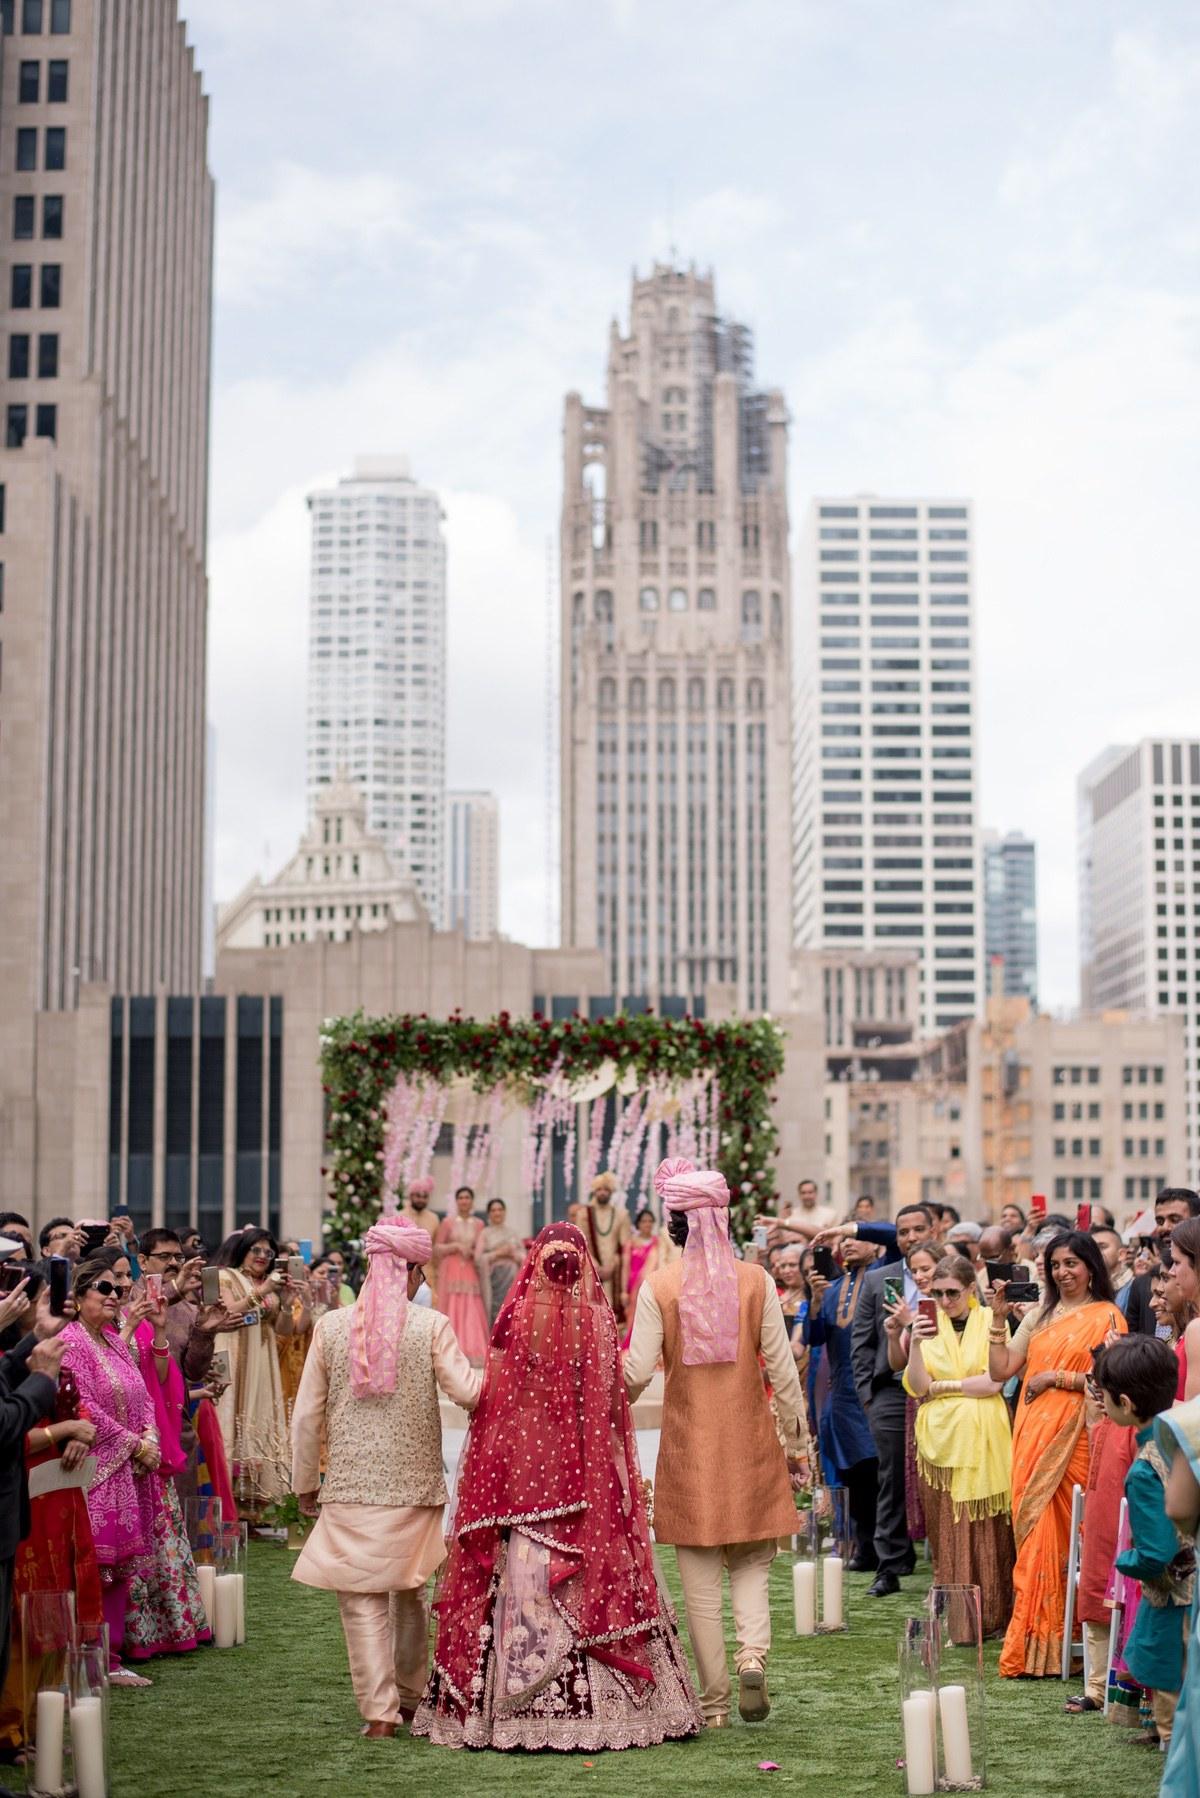 Le_Cape_Weddings_-_Serena_-_Chicago_South_Asian_Wedding_-_Ceremony_--43.jpg